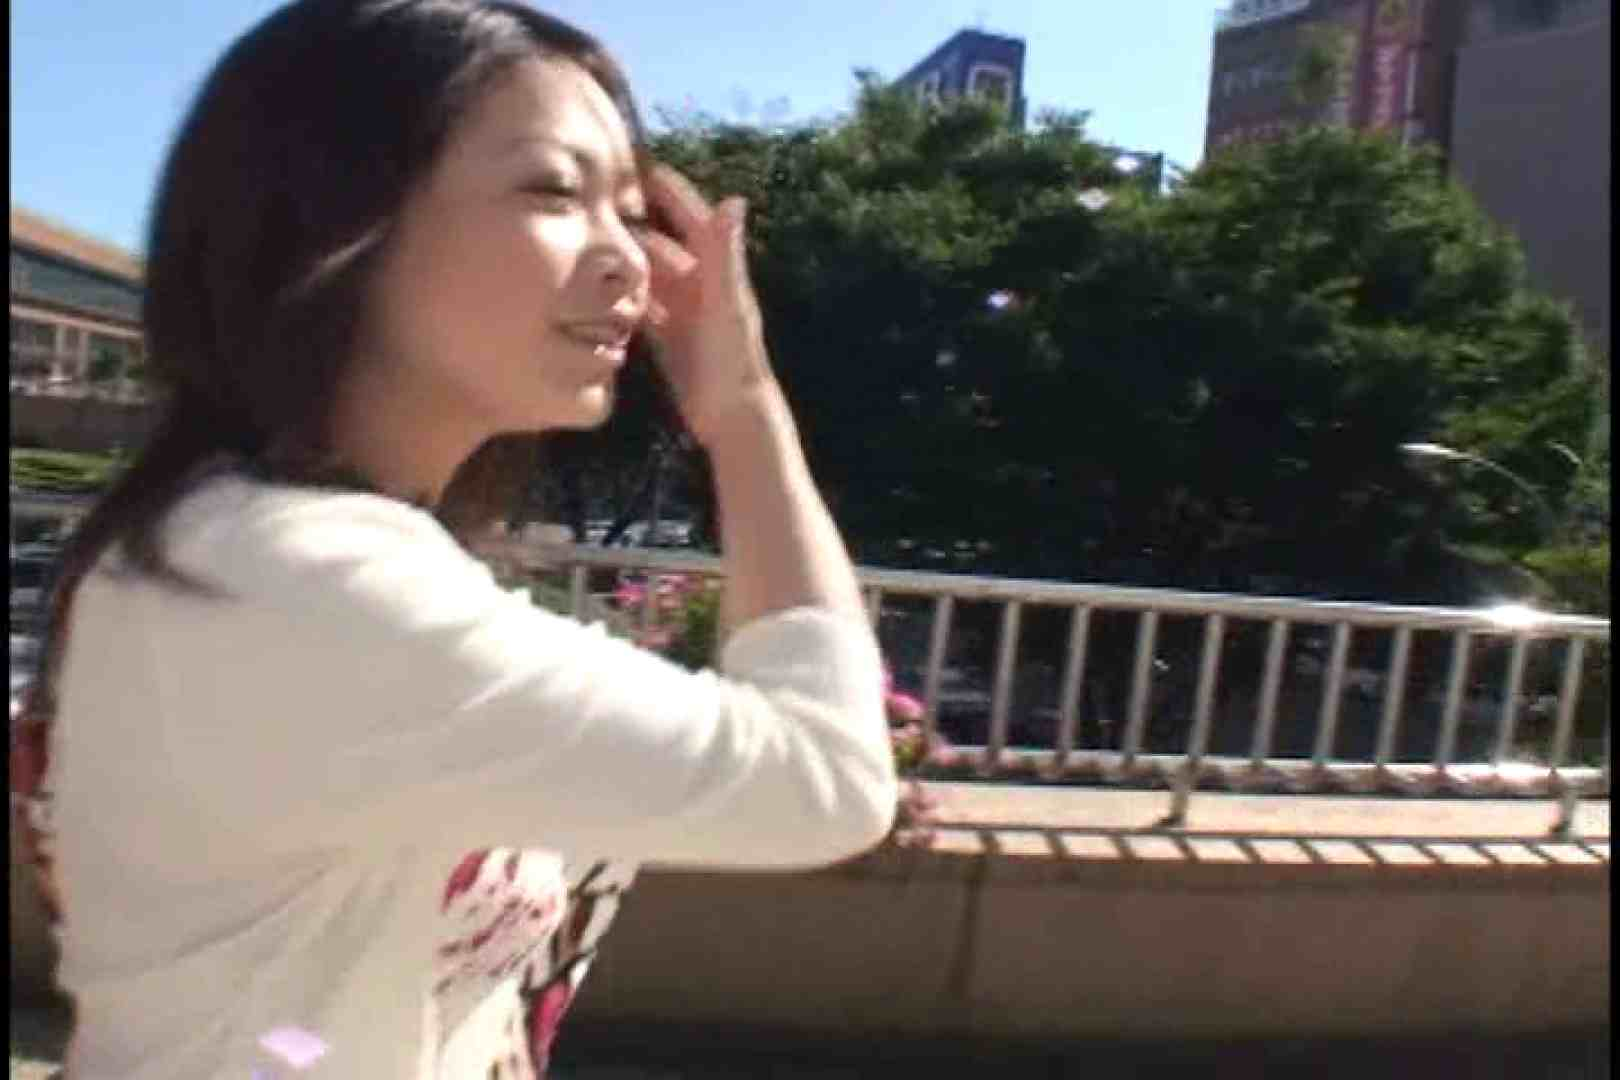 JDハンター全国ツアー vol.006 前編 超エロ女子大生  59枚 12